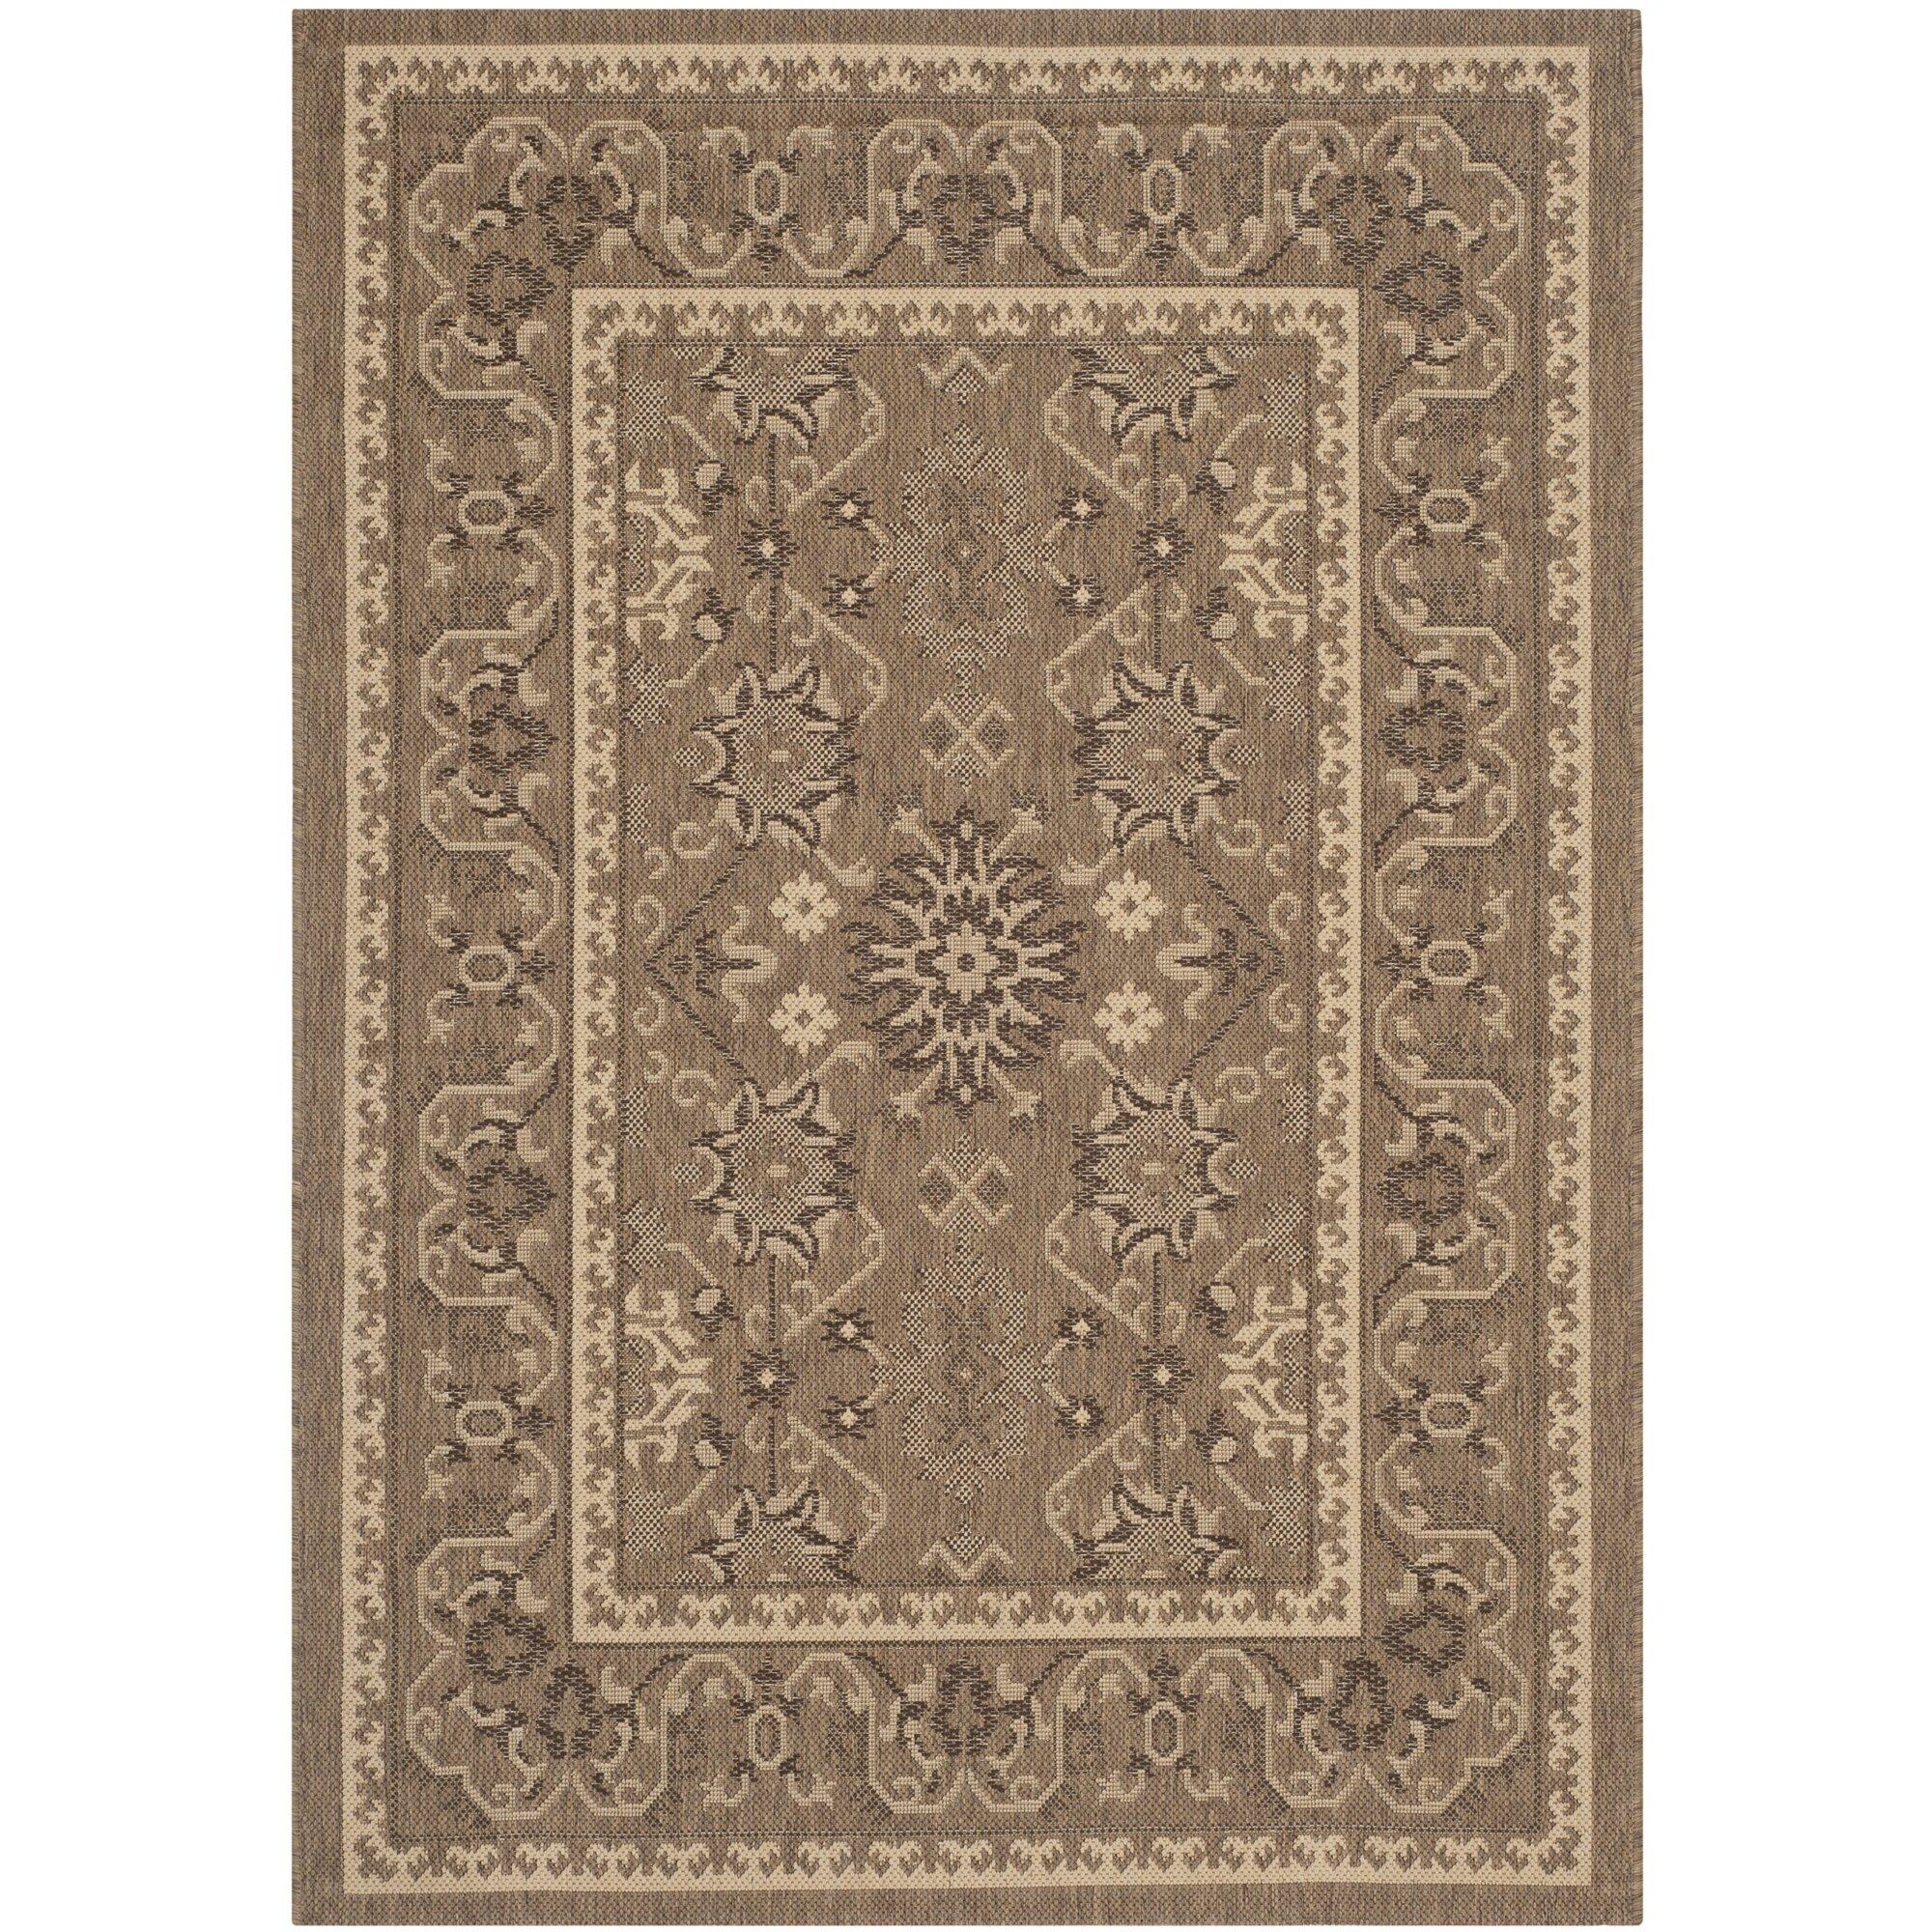 Alcott hill bacall brown creme indoor outdoor area rug for Landscape indoor area rug